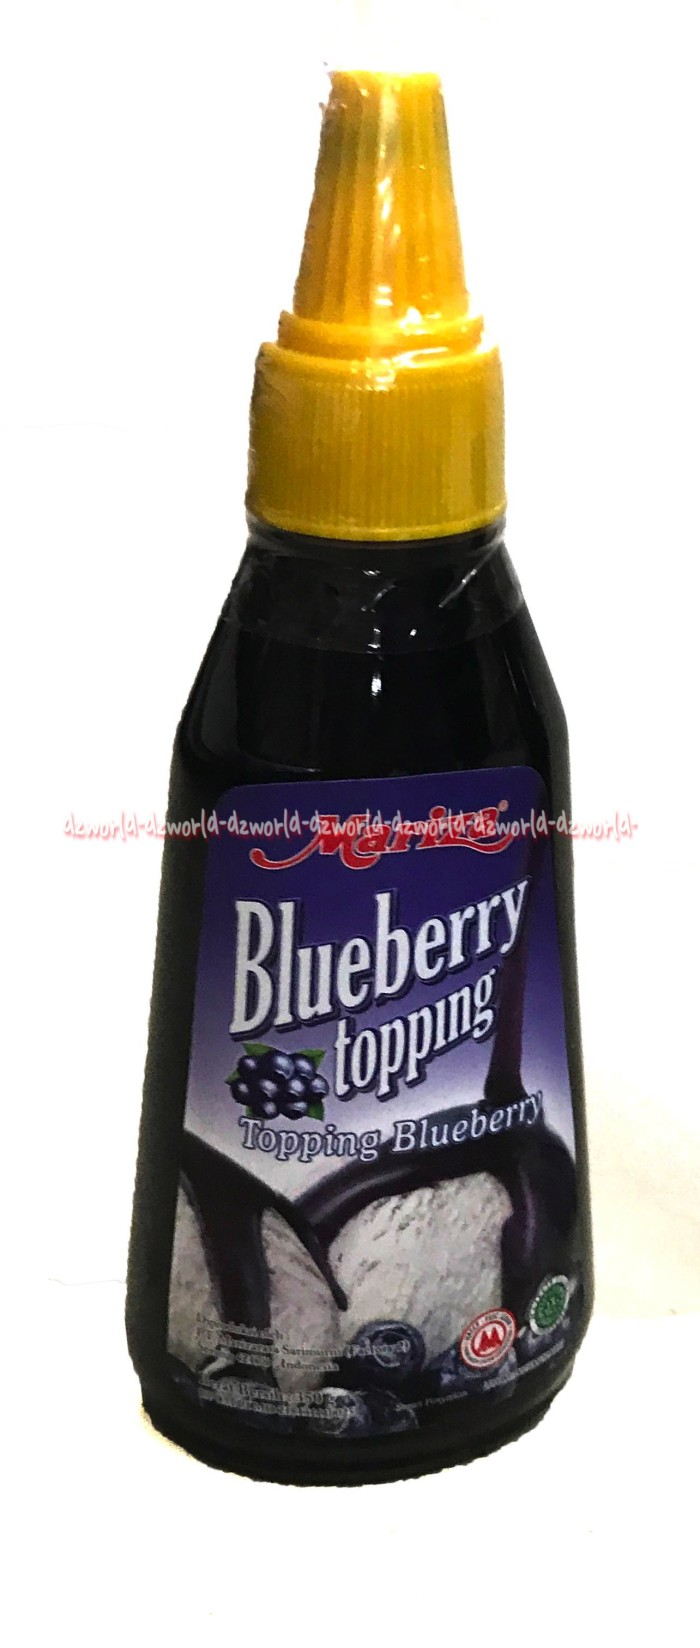 Mariza blueberry topping bisa dipadukan buat makanan atau minuman 350g